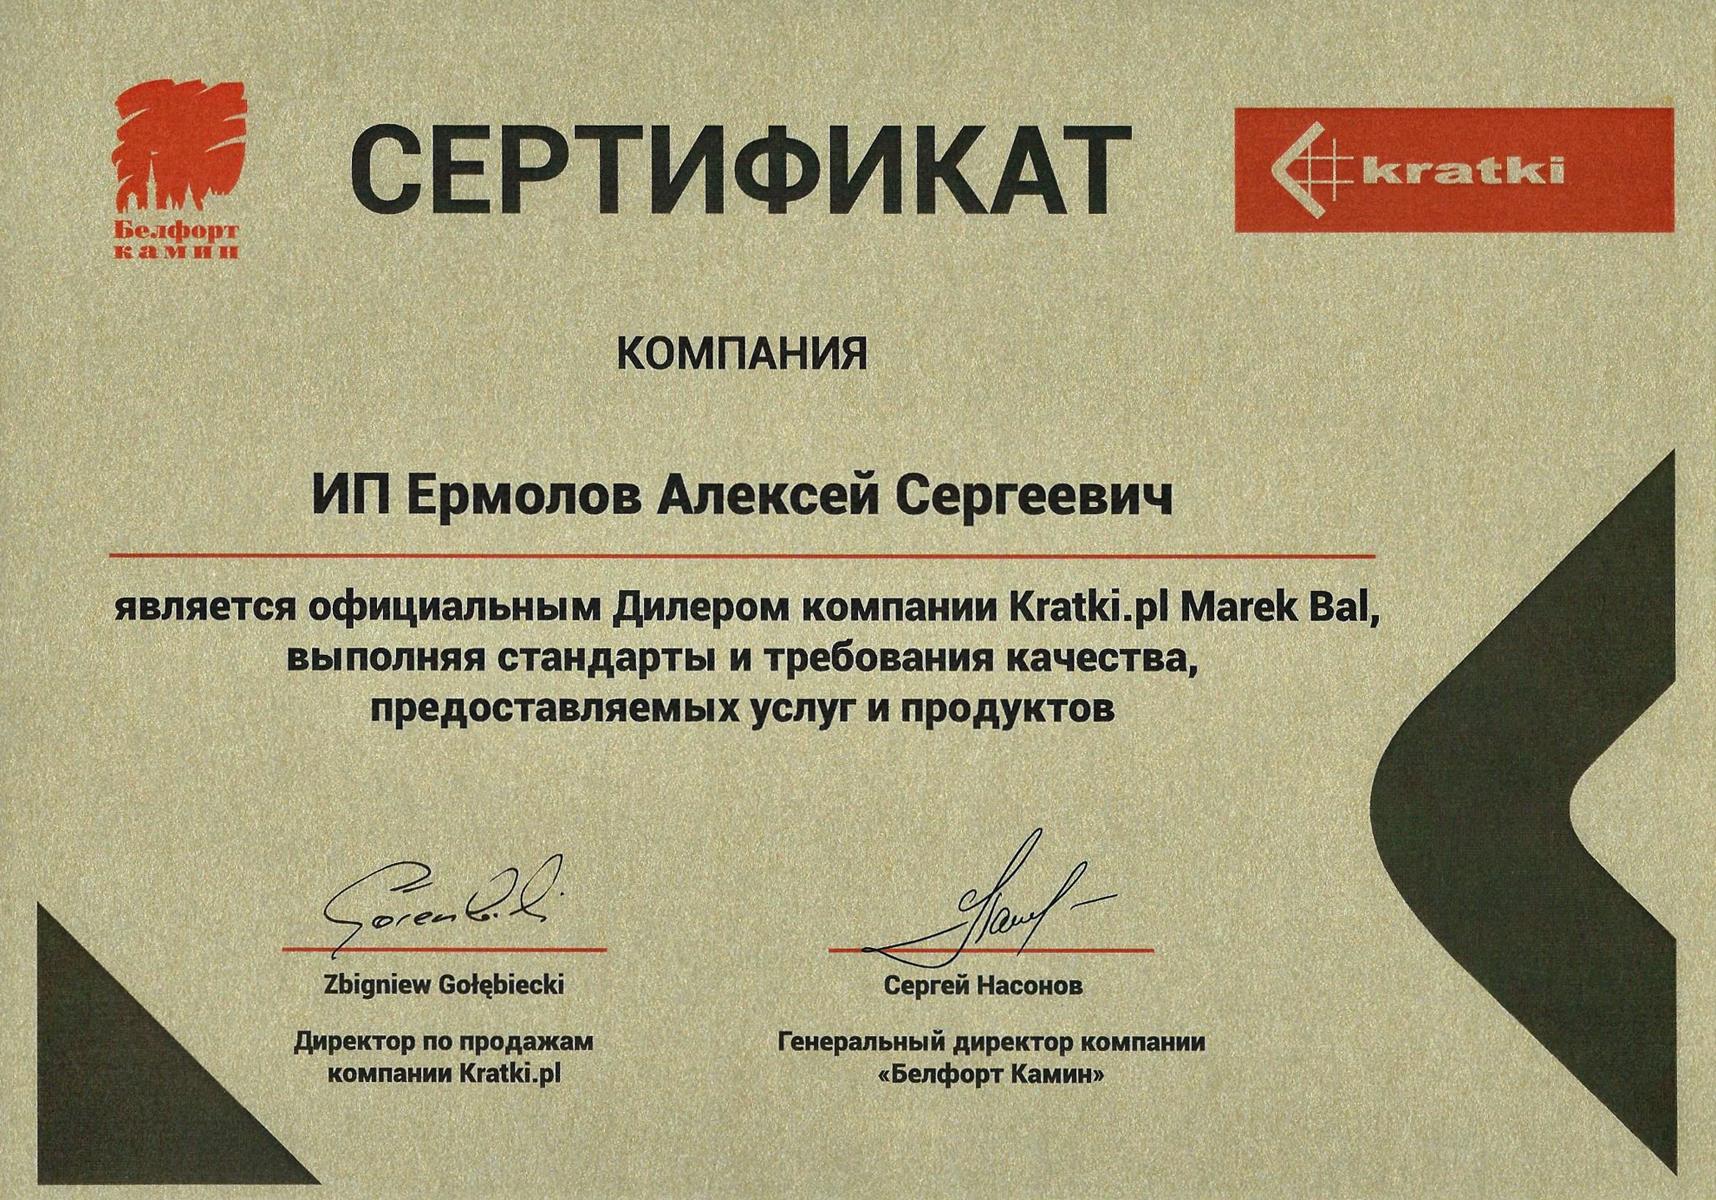 Сертификат_дилера_Kratki.jpg